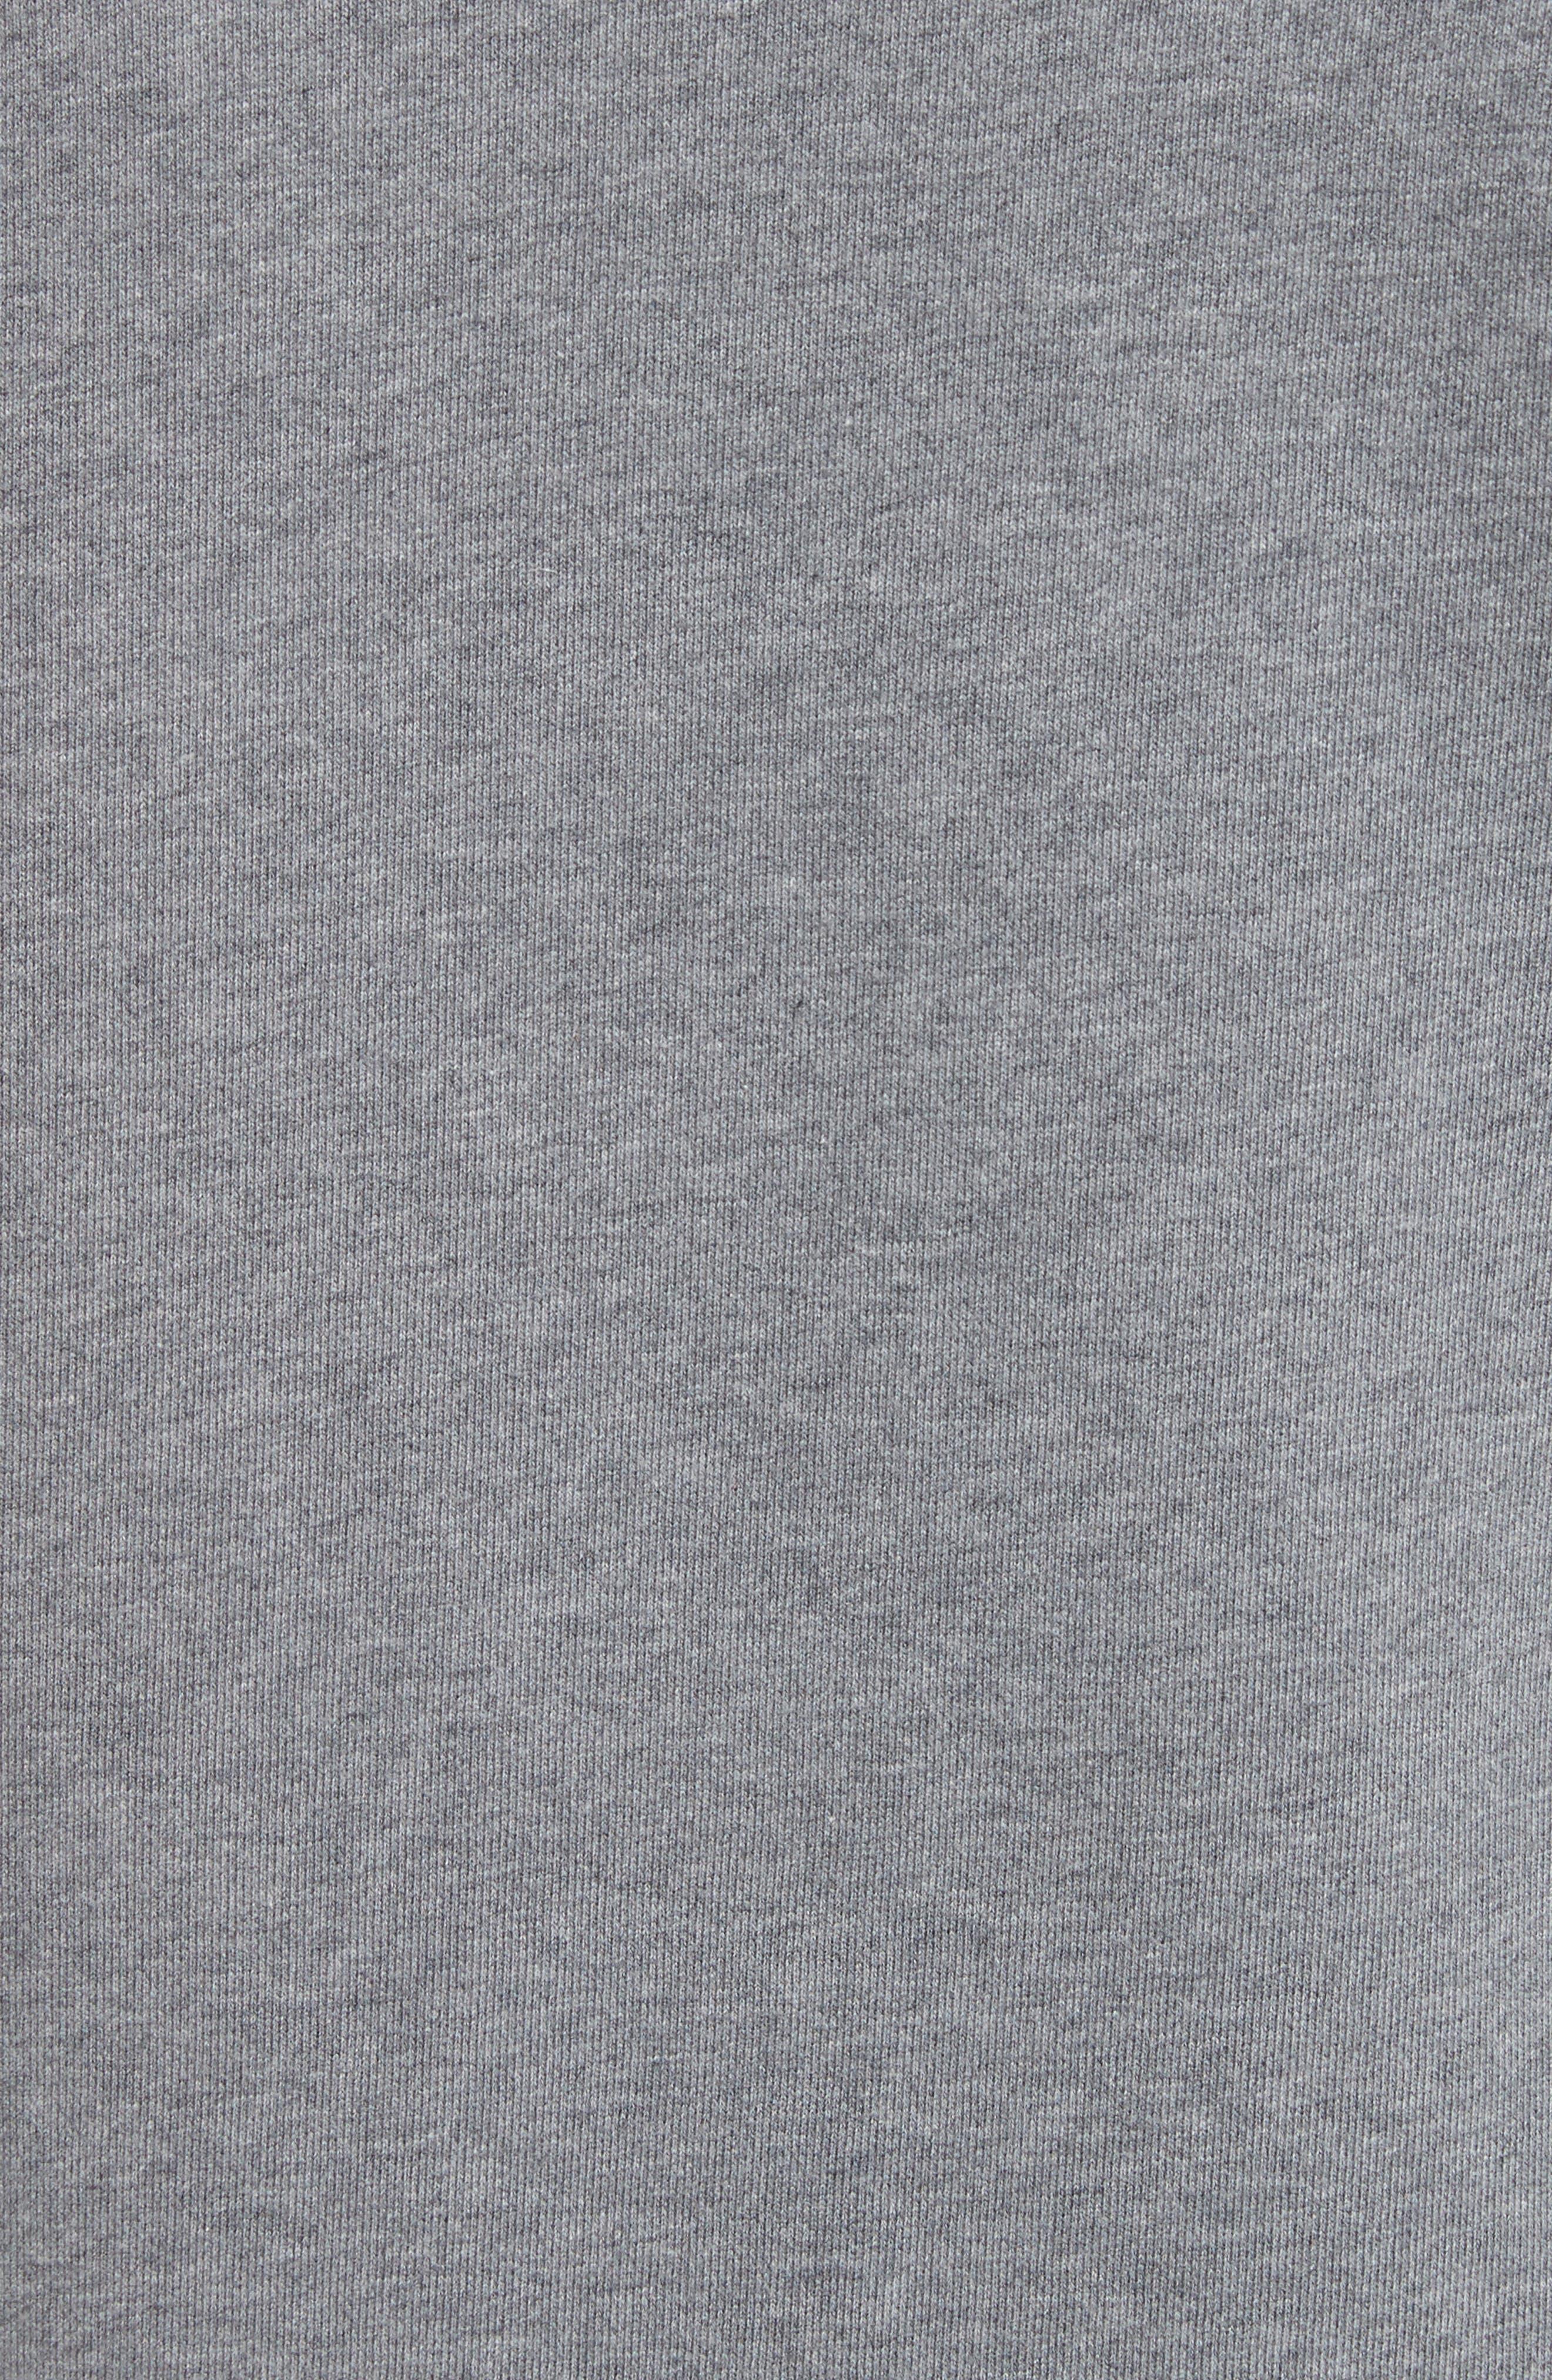 Jefferson Fleece Sweatshirt,                             Alternate thumbnail 5, color,                             020